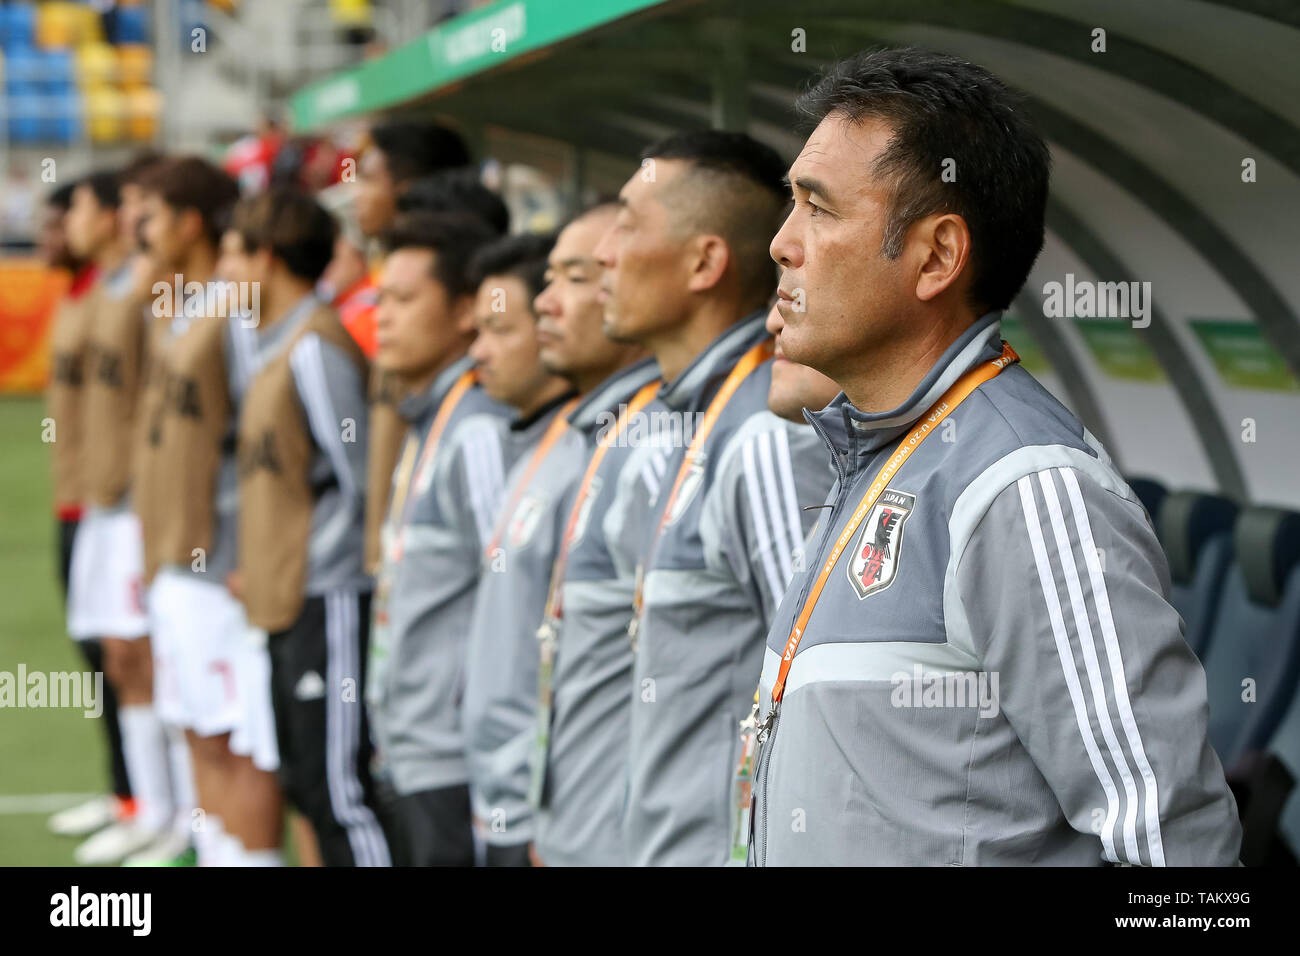 Gdynia Stadium, Gdynia, Poland - 26th May, 2019: Masanaga Kageyama, Head Coach from Japan seen before FIFA U-20 World Cup match between Mexico and Japan (GROUP B) in Gdynia. (Final score; Mexico 0:3 Japan) - Stock Image